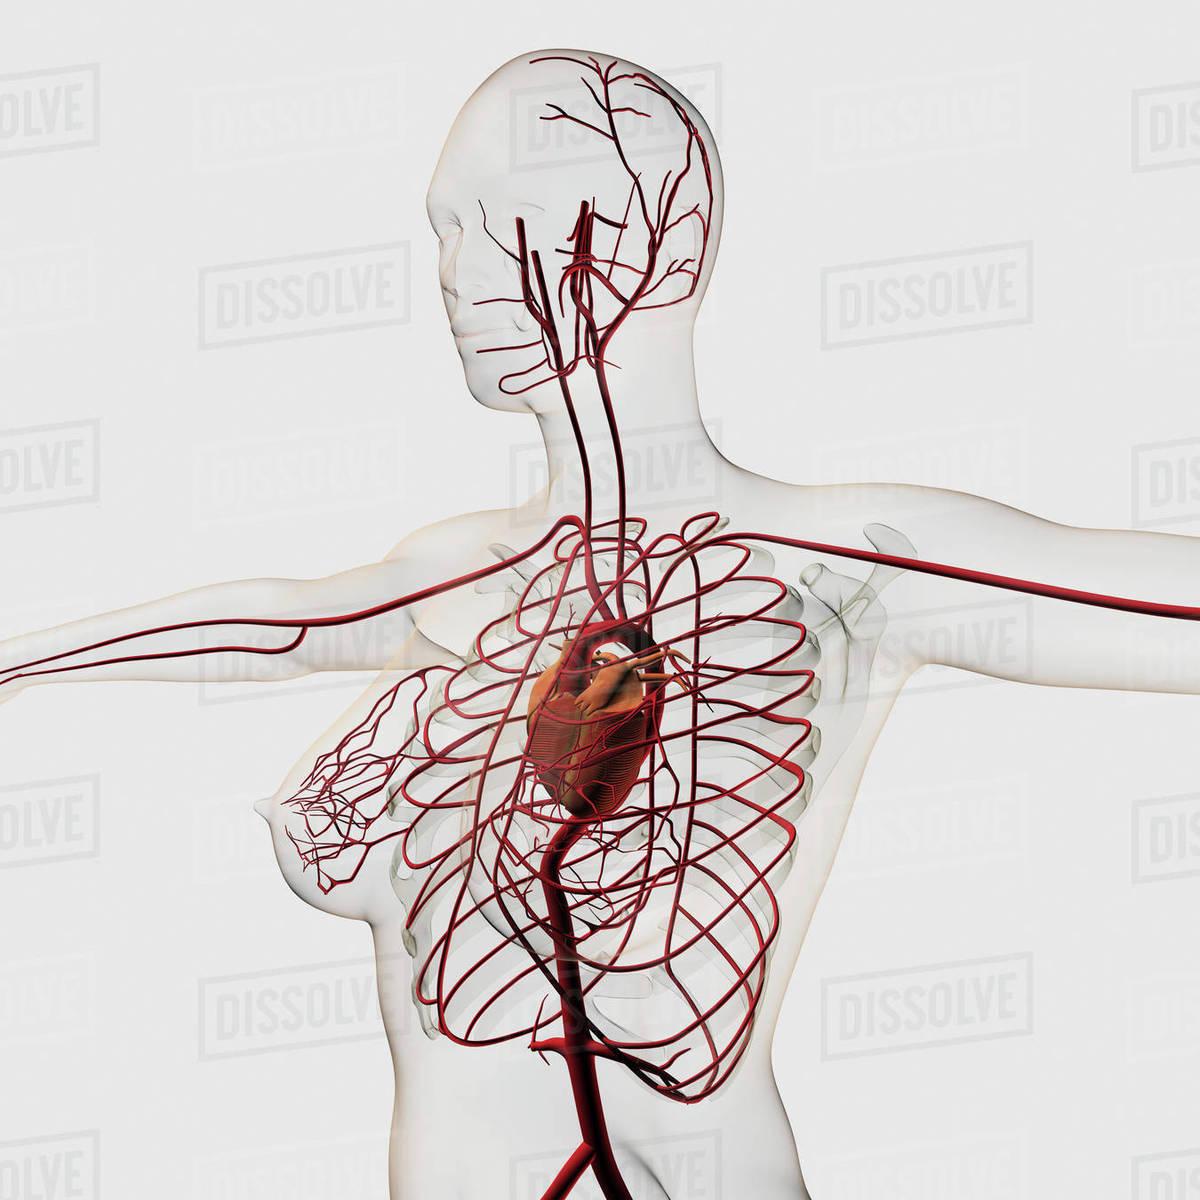 Medical Illustration Of Female Circulatory System Stock Photo